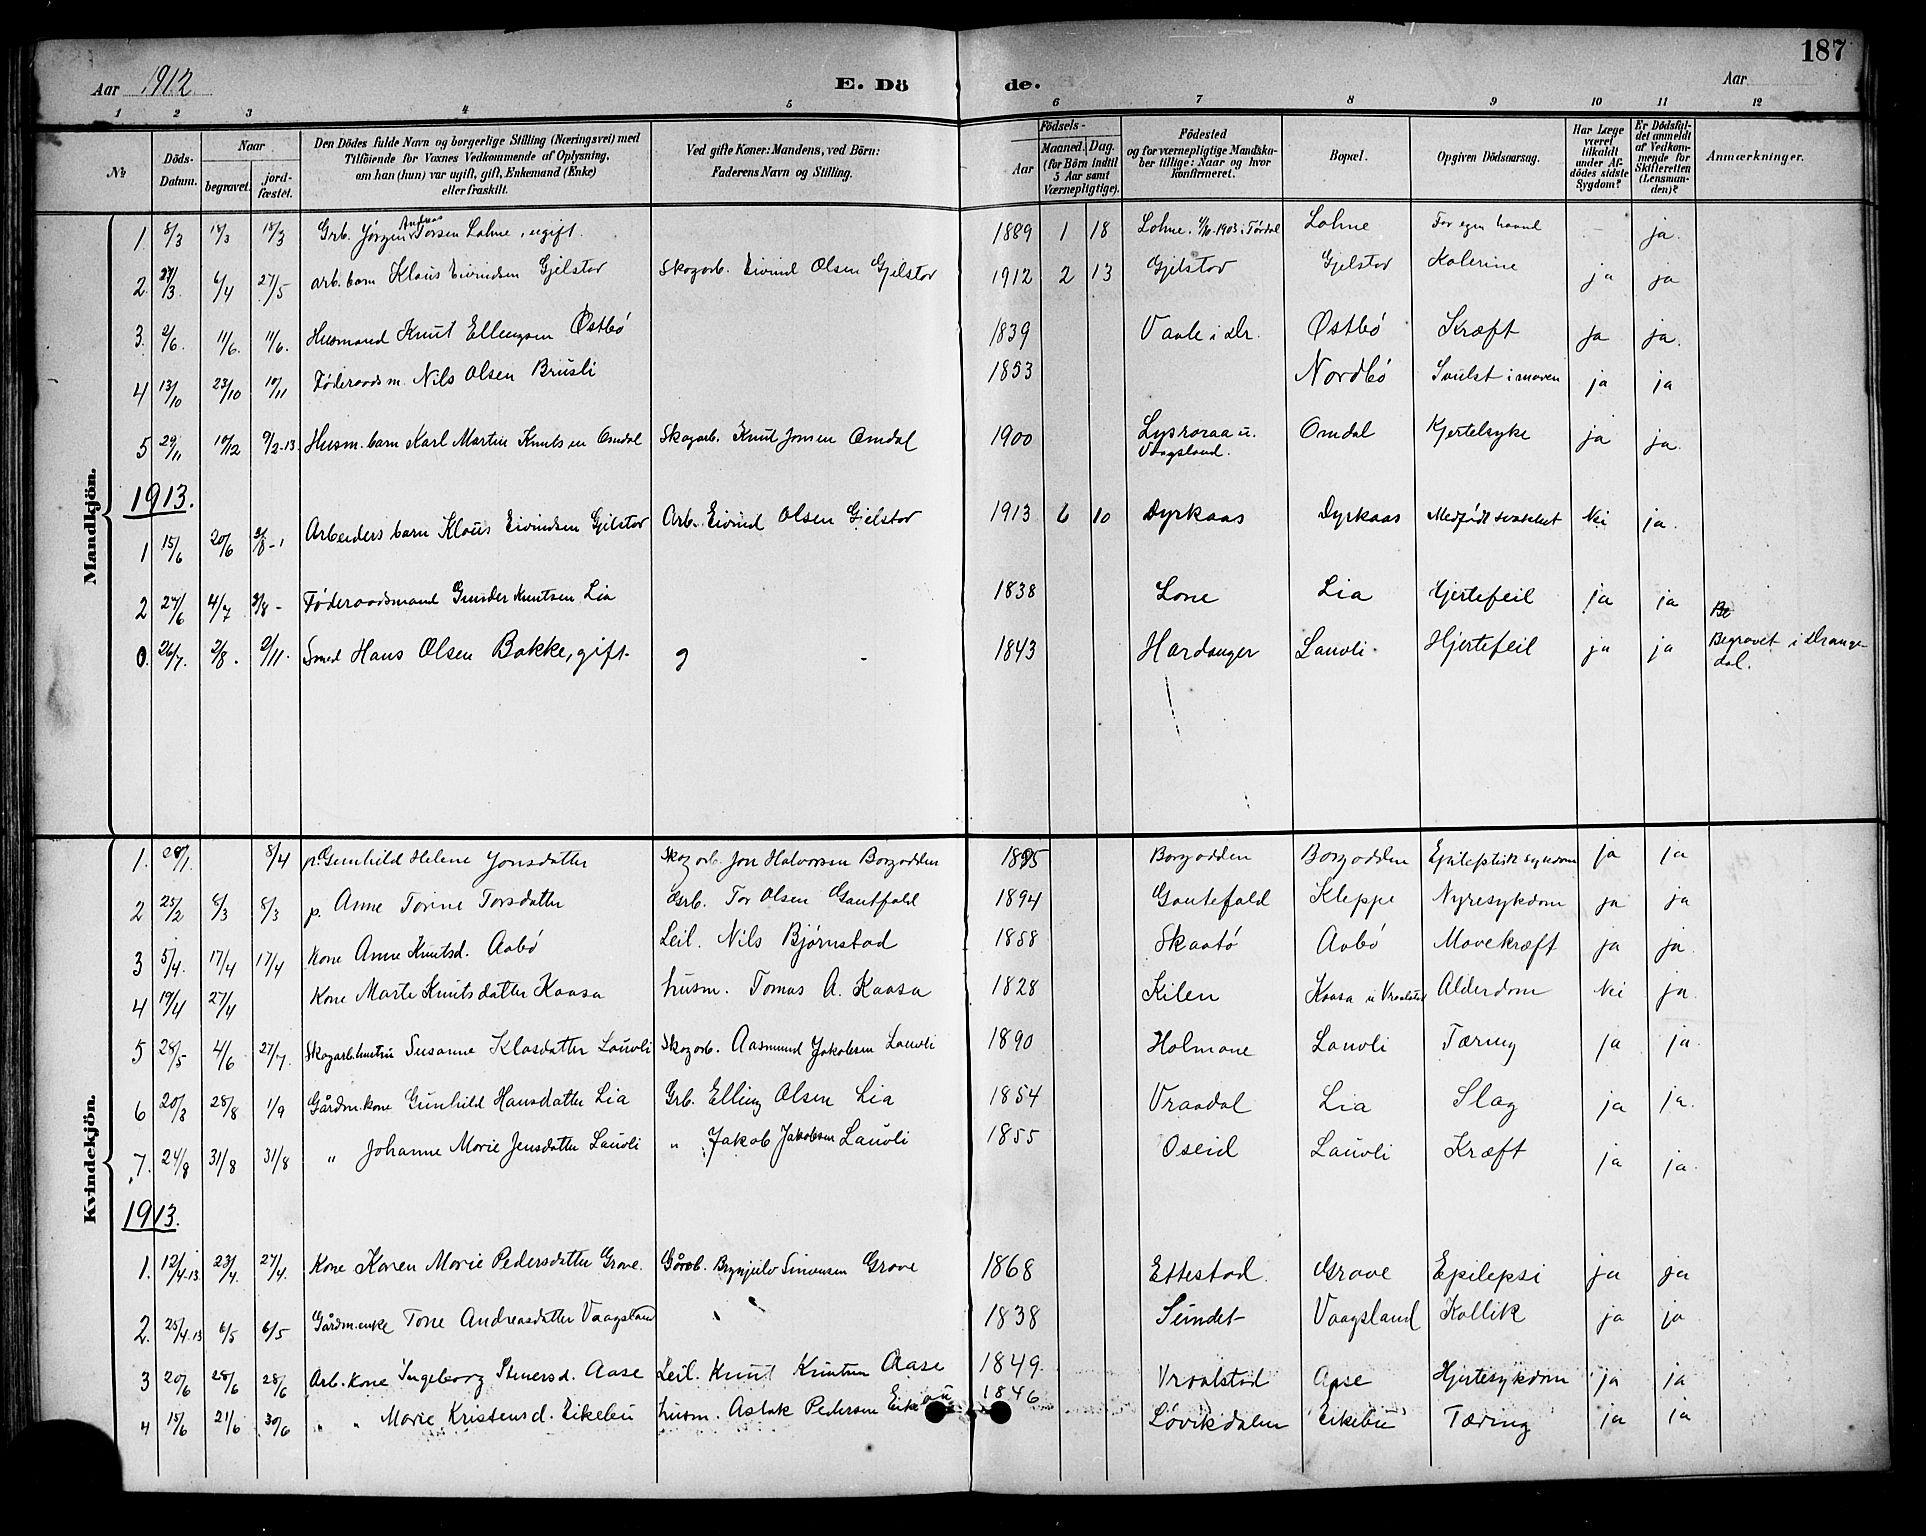 SAKO, Drangedal kirkebøker, G/Gb/L0002: Klokkerbok nr. II 2, 1895-1918, s. 187